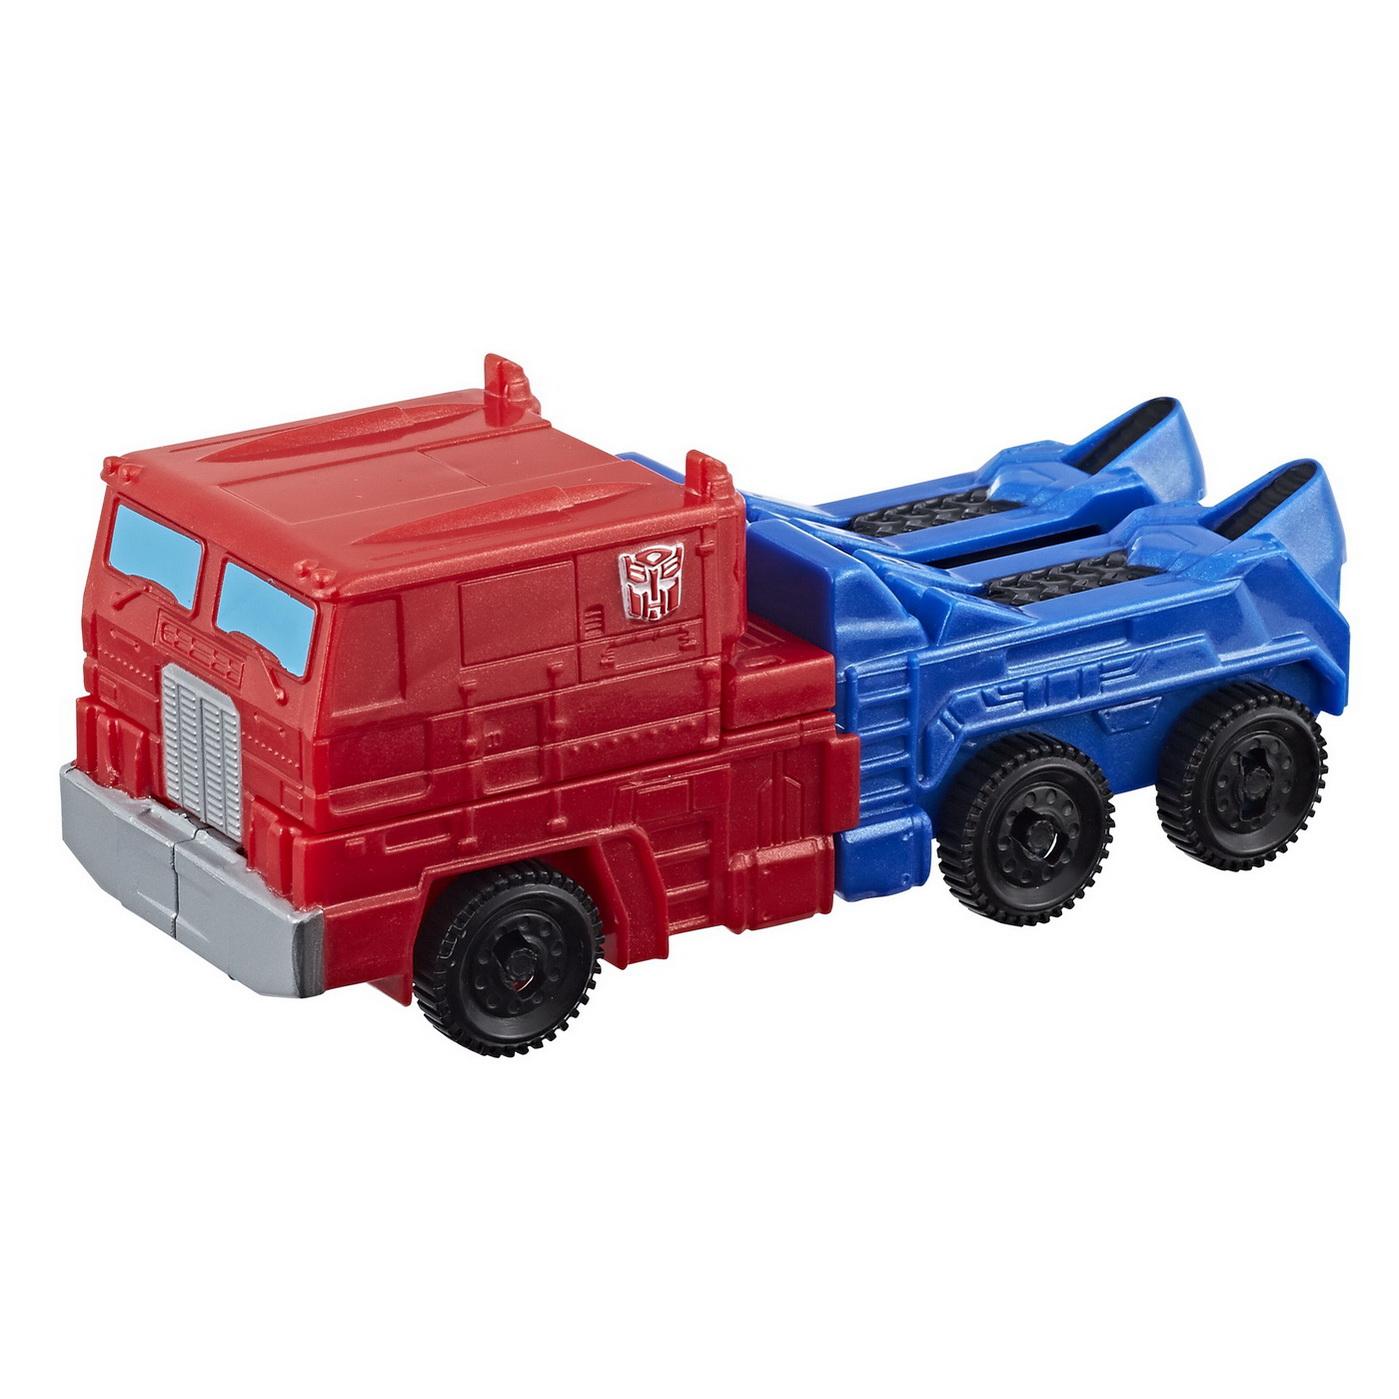 Jucarie - Transformers: Autobot Optimus Prime | Hasbro - 2